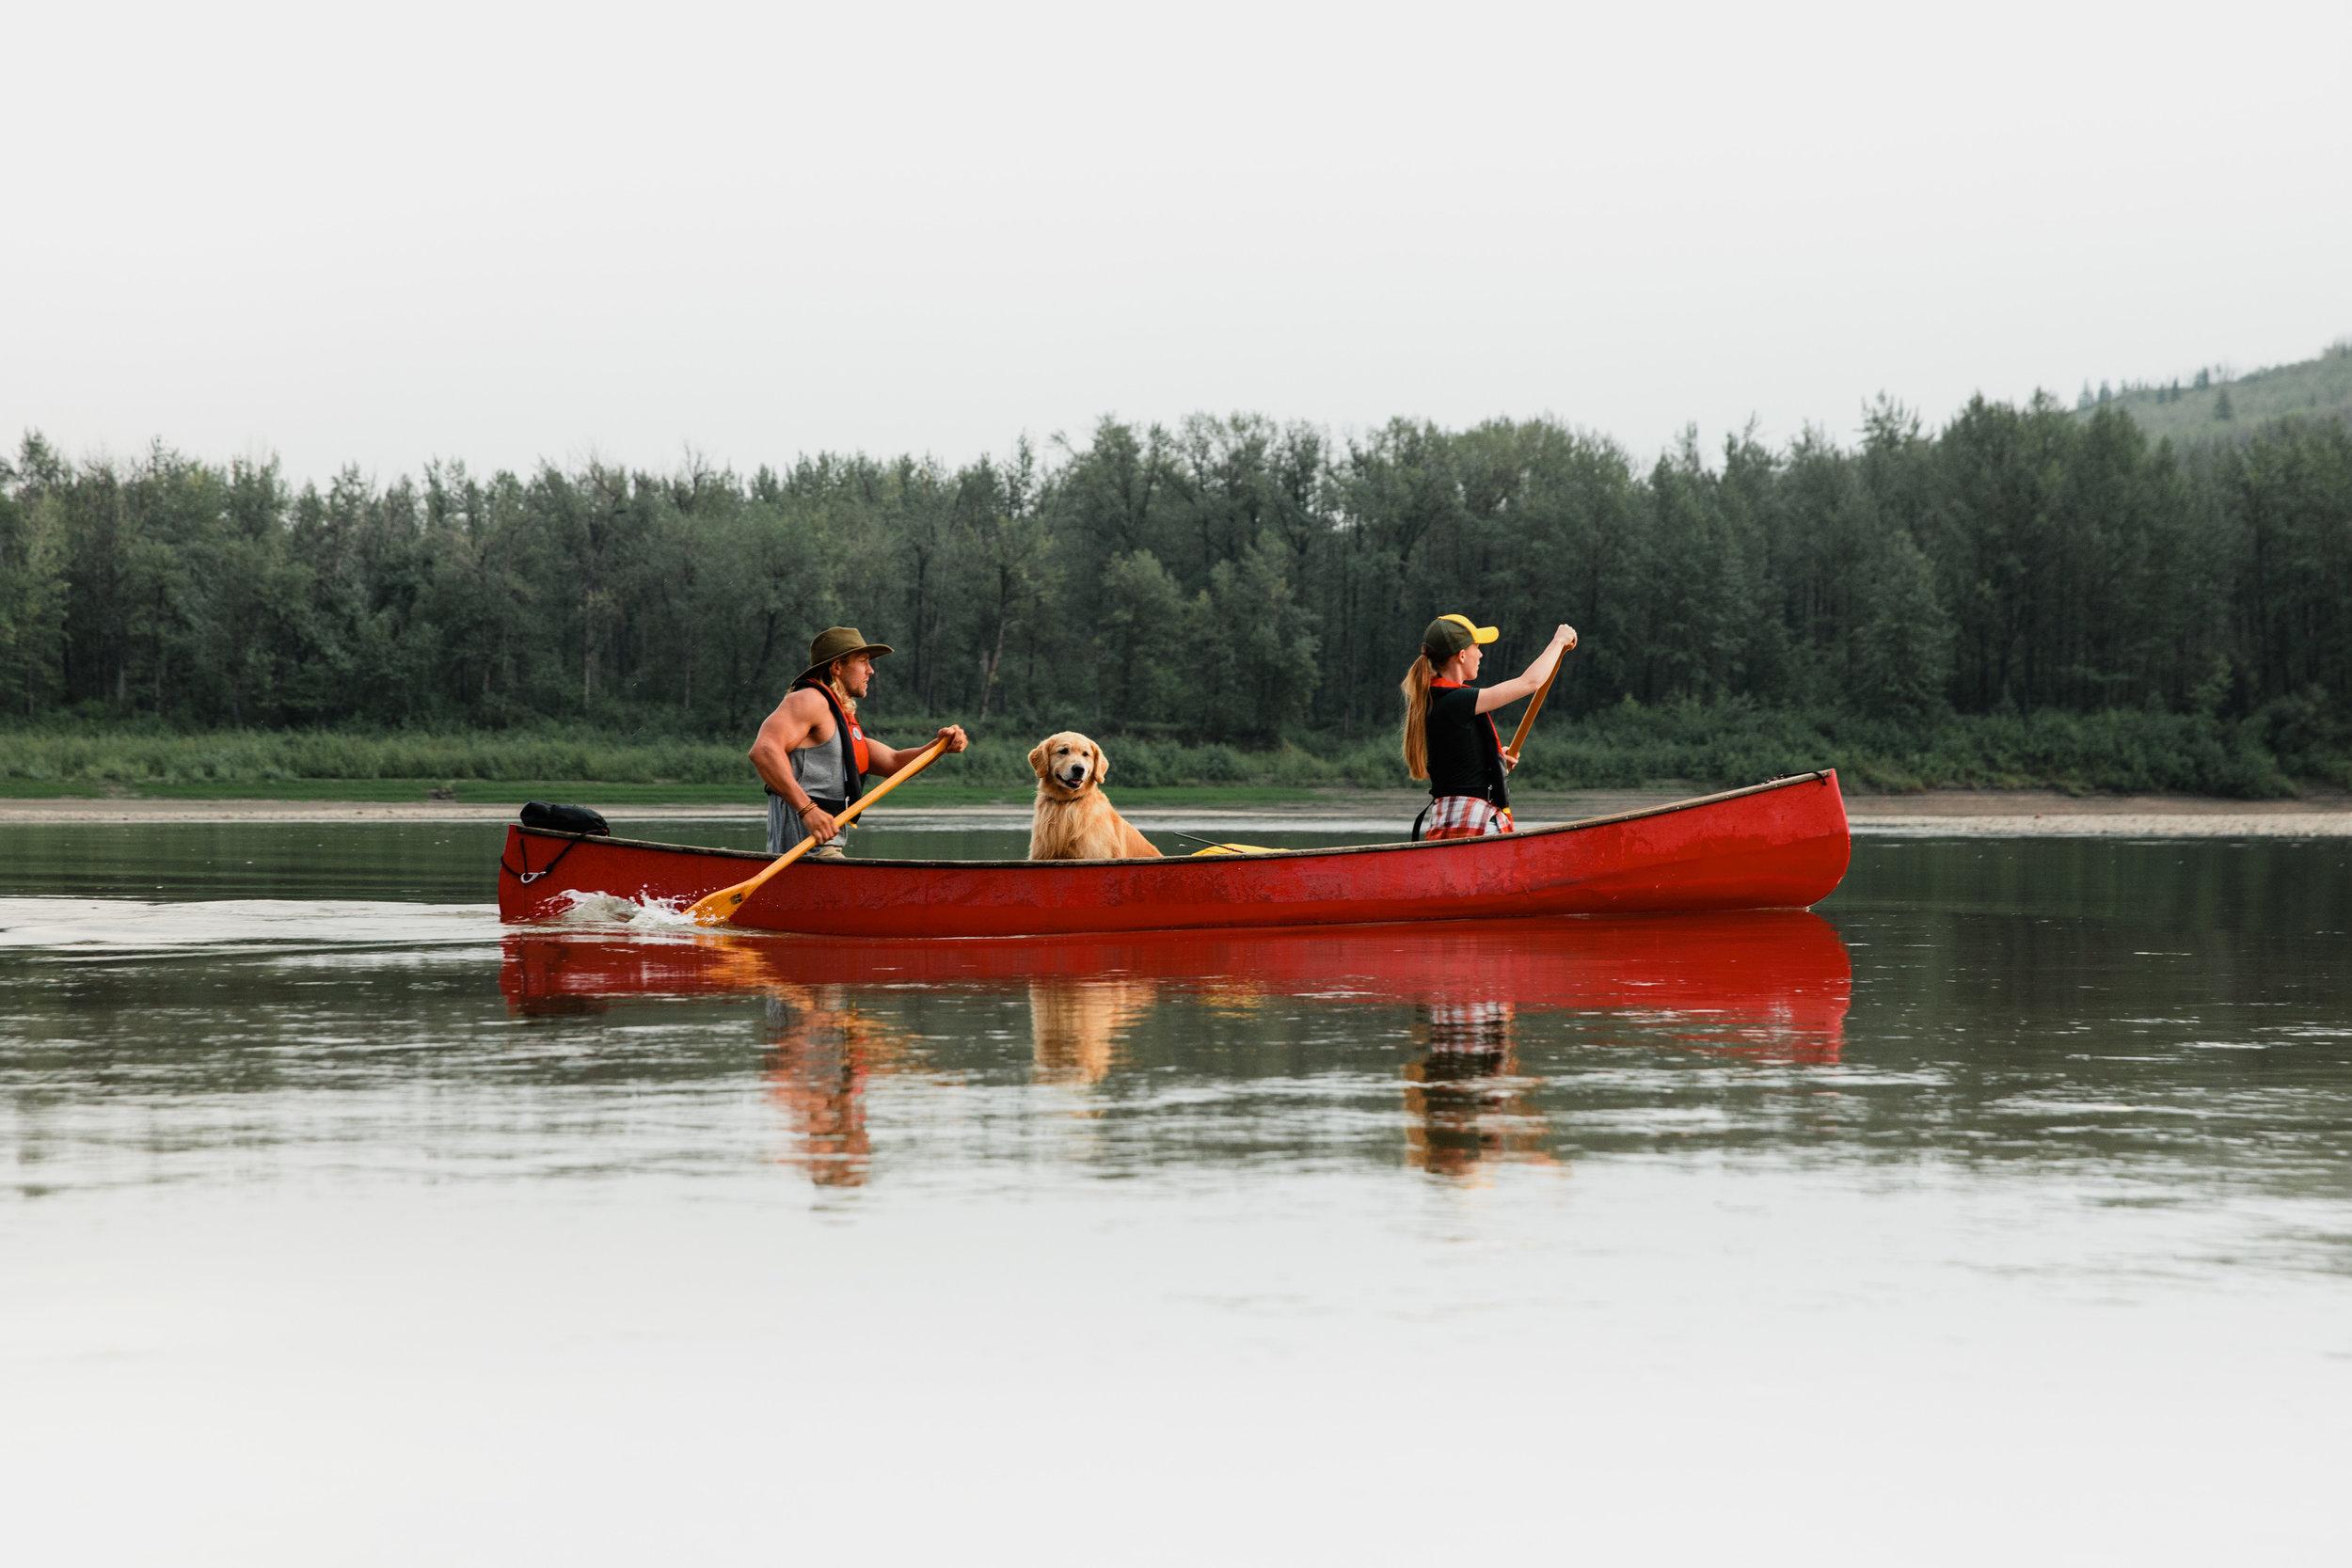 MikeSeehagel-TravelAlberta-Ready-Rebrand_Canada-LifestylePhotography_28.jpg